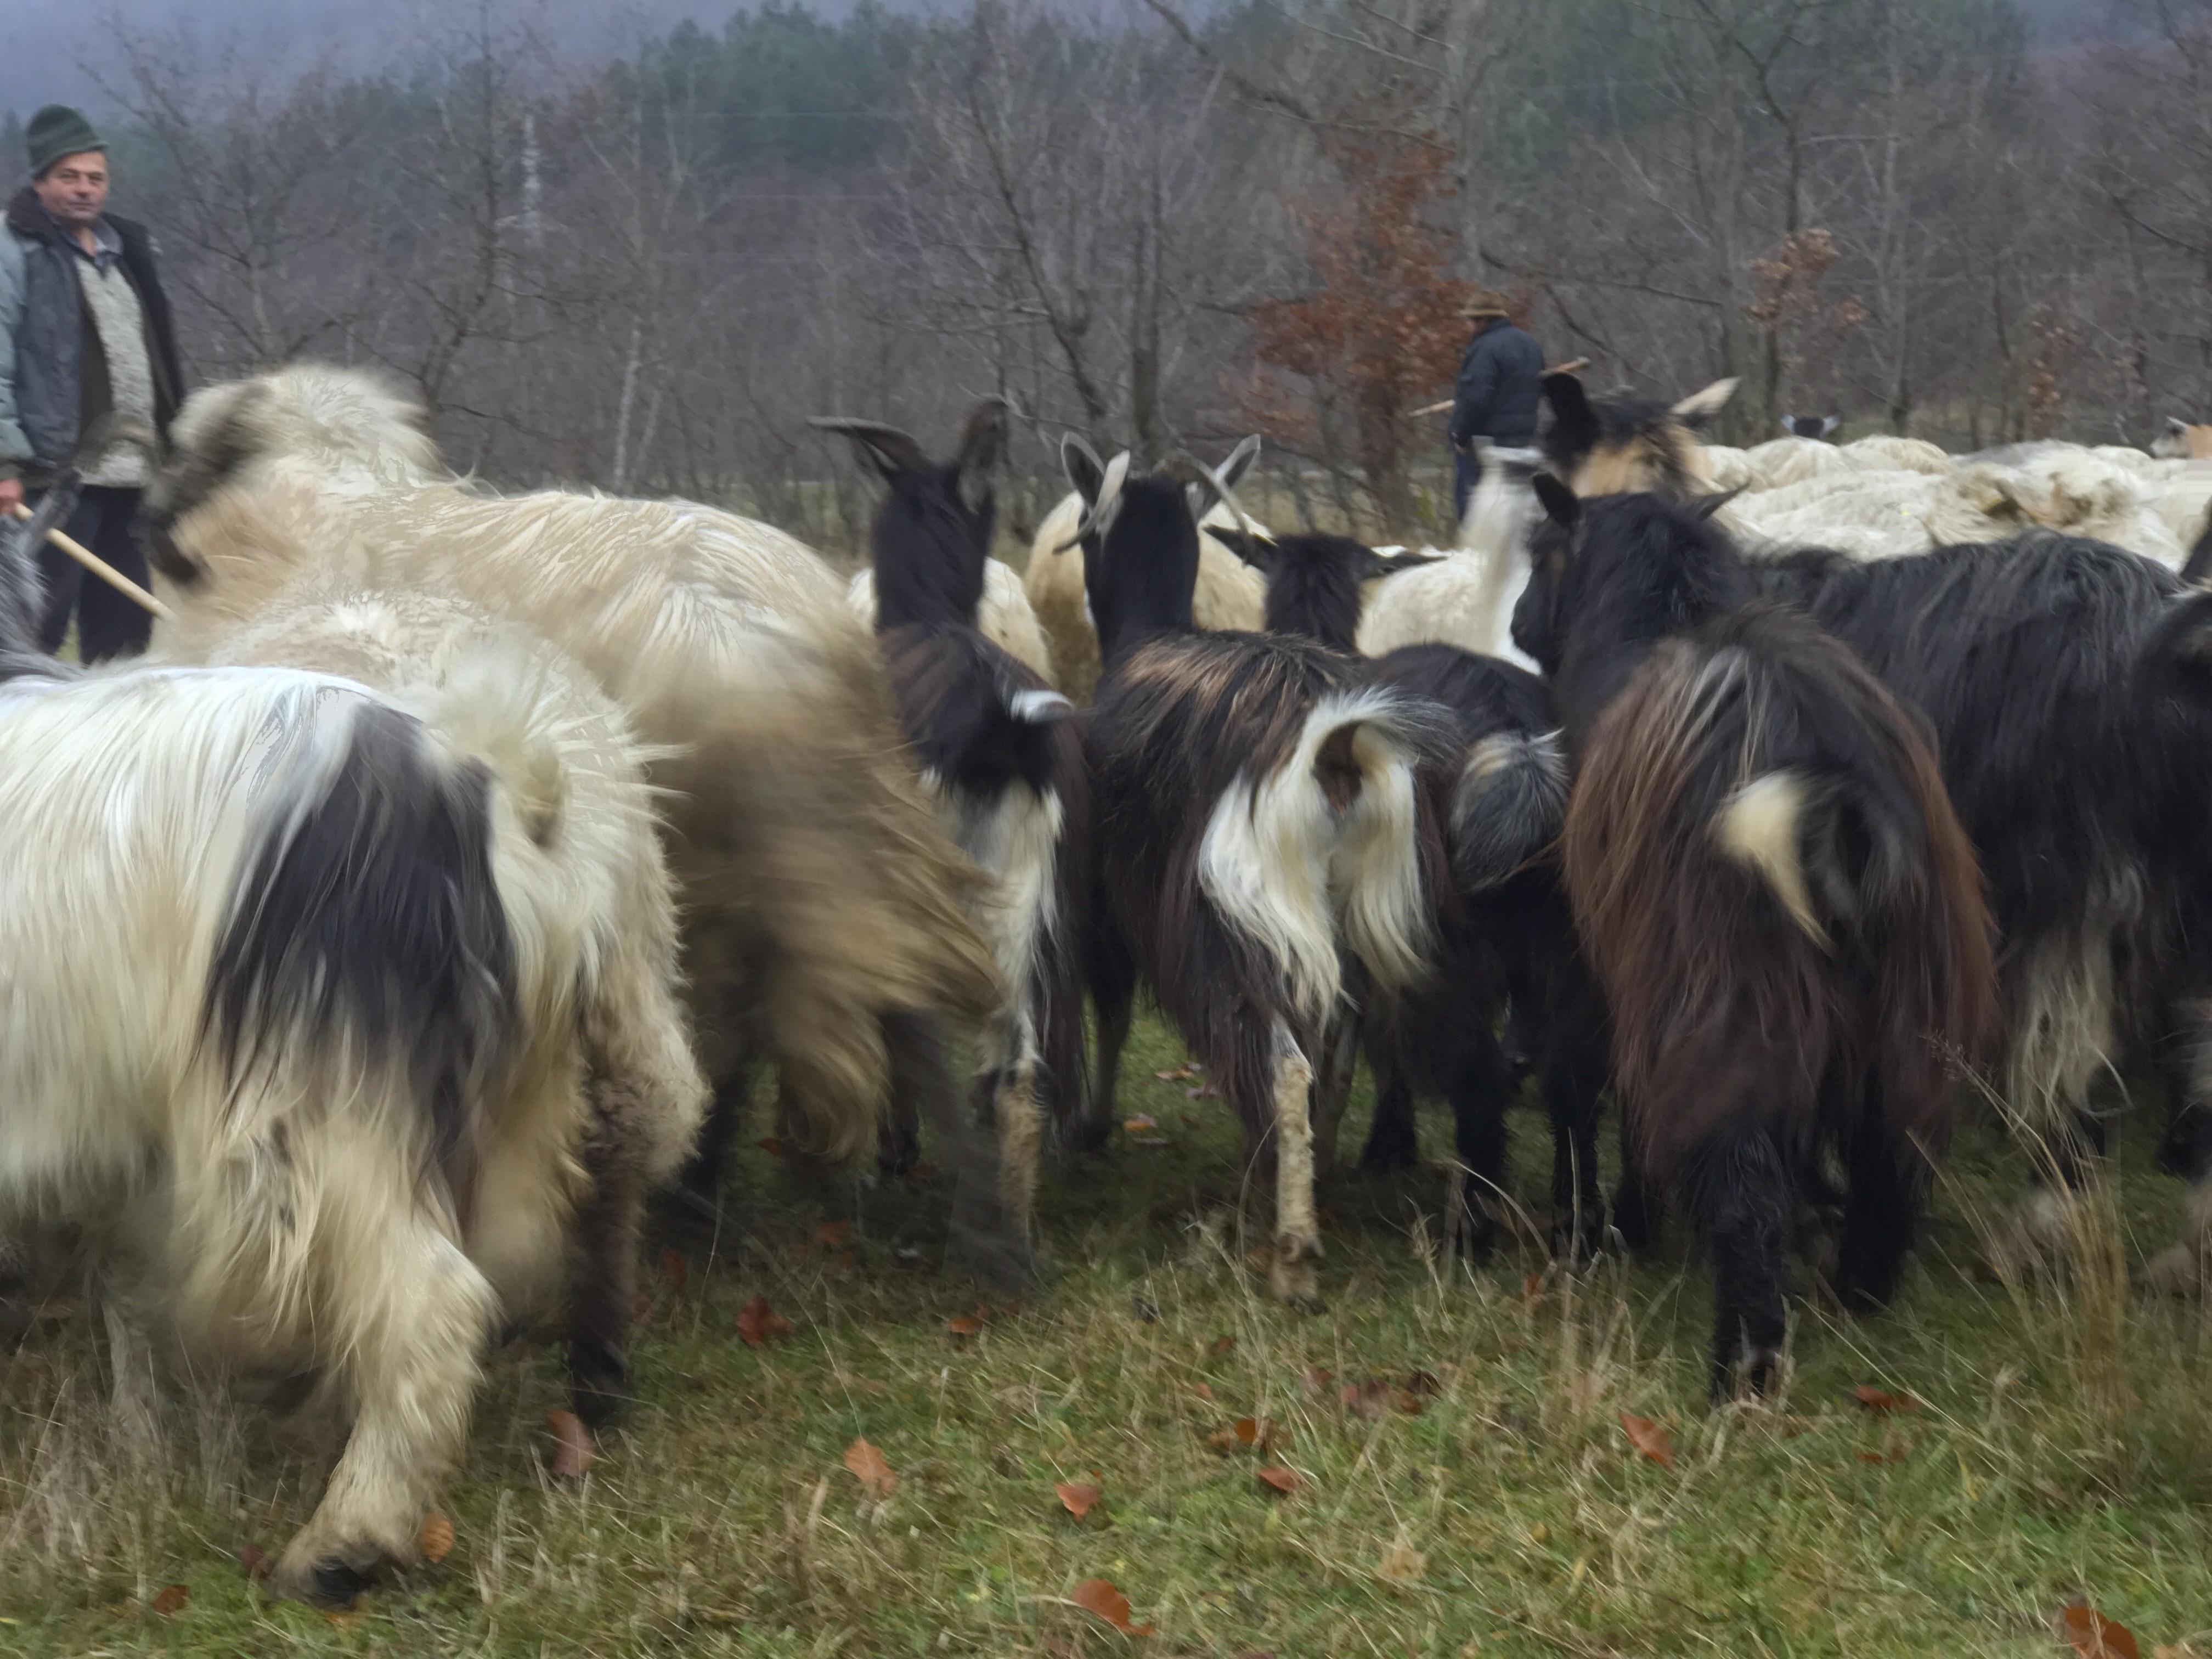 Sheeps and goats, Romania